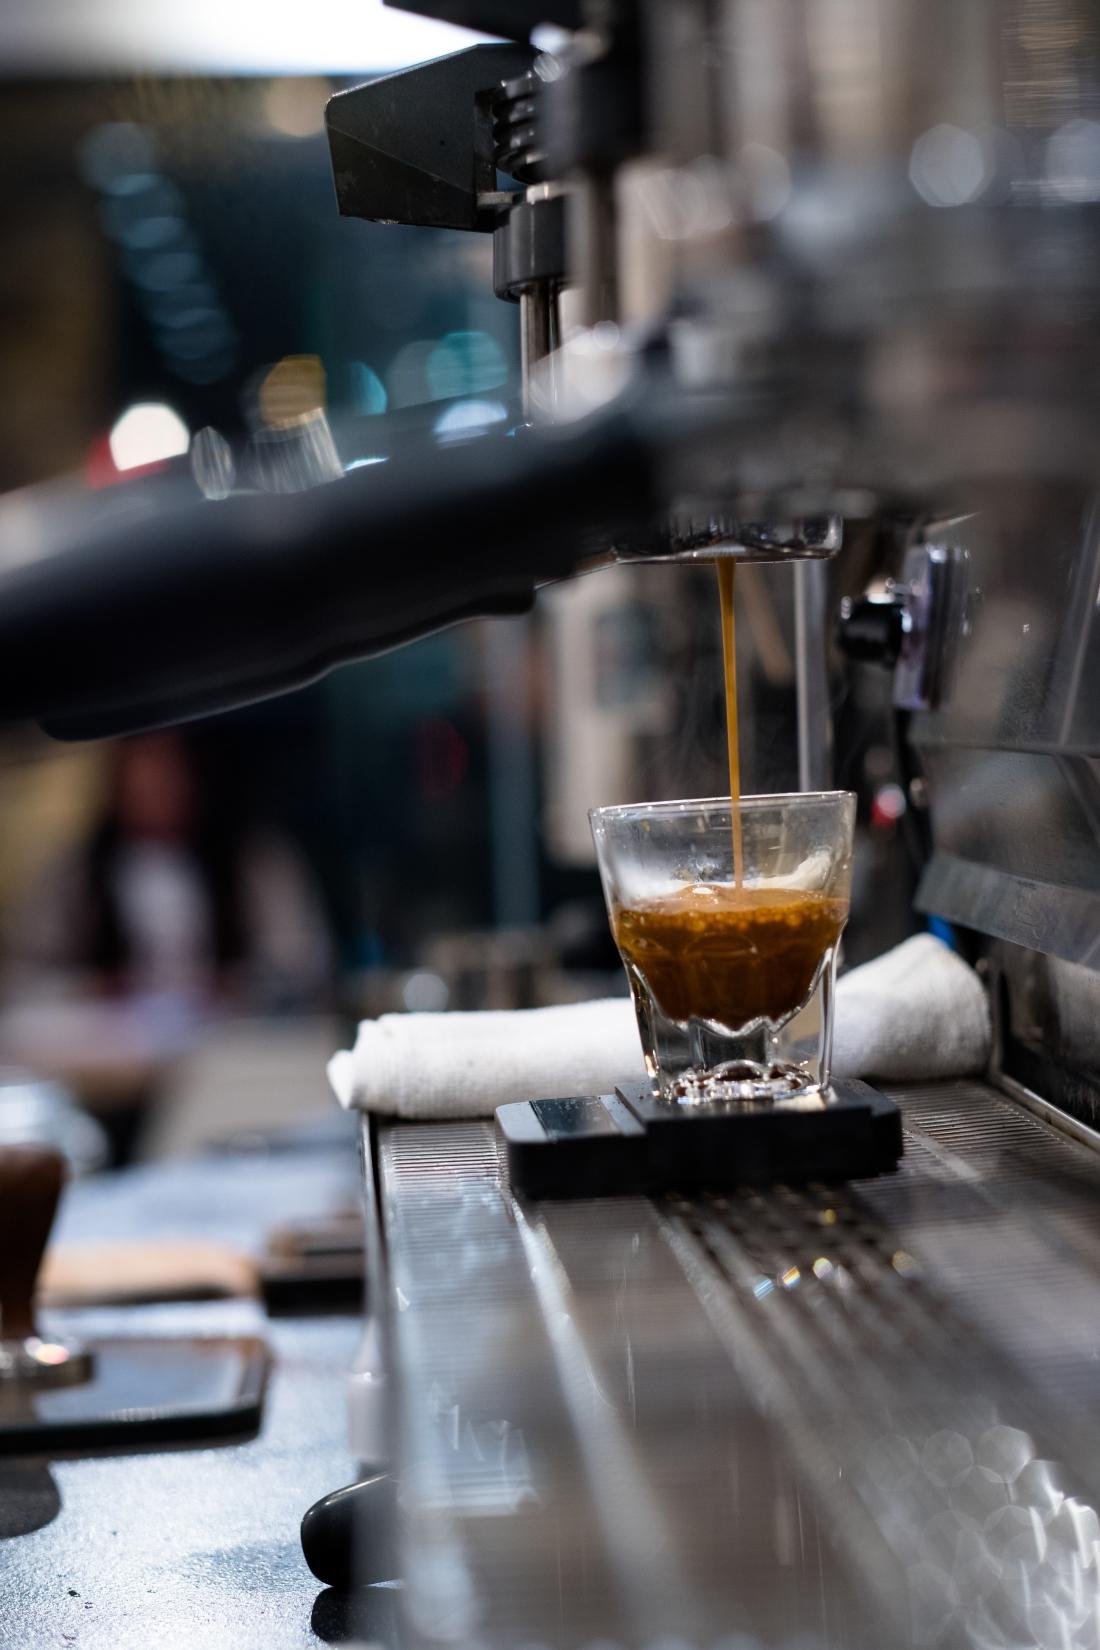 Espresso // All photos by Kenleigh Umali